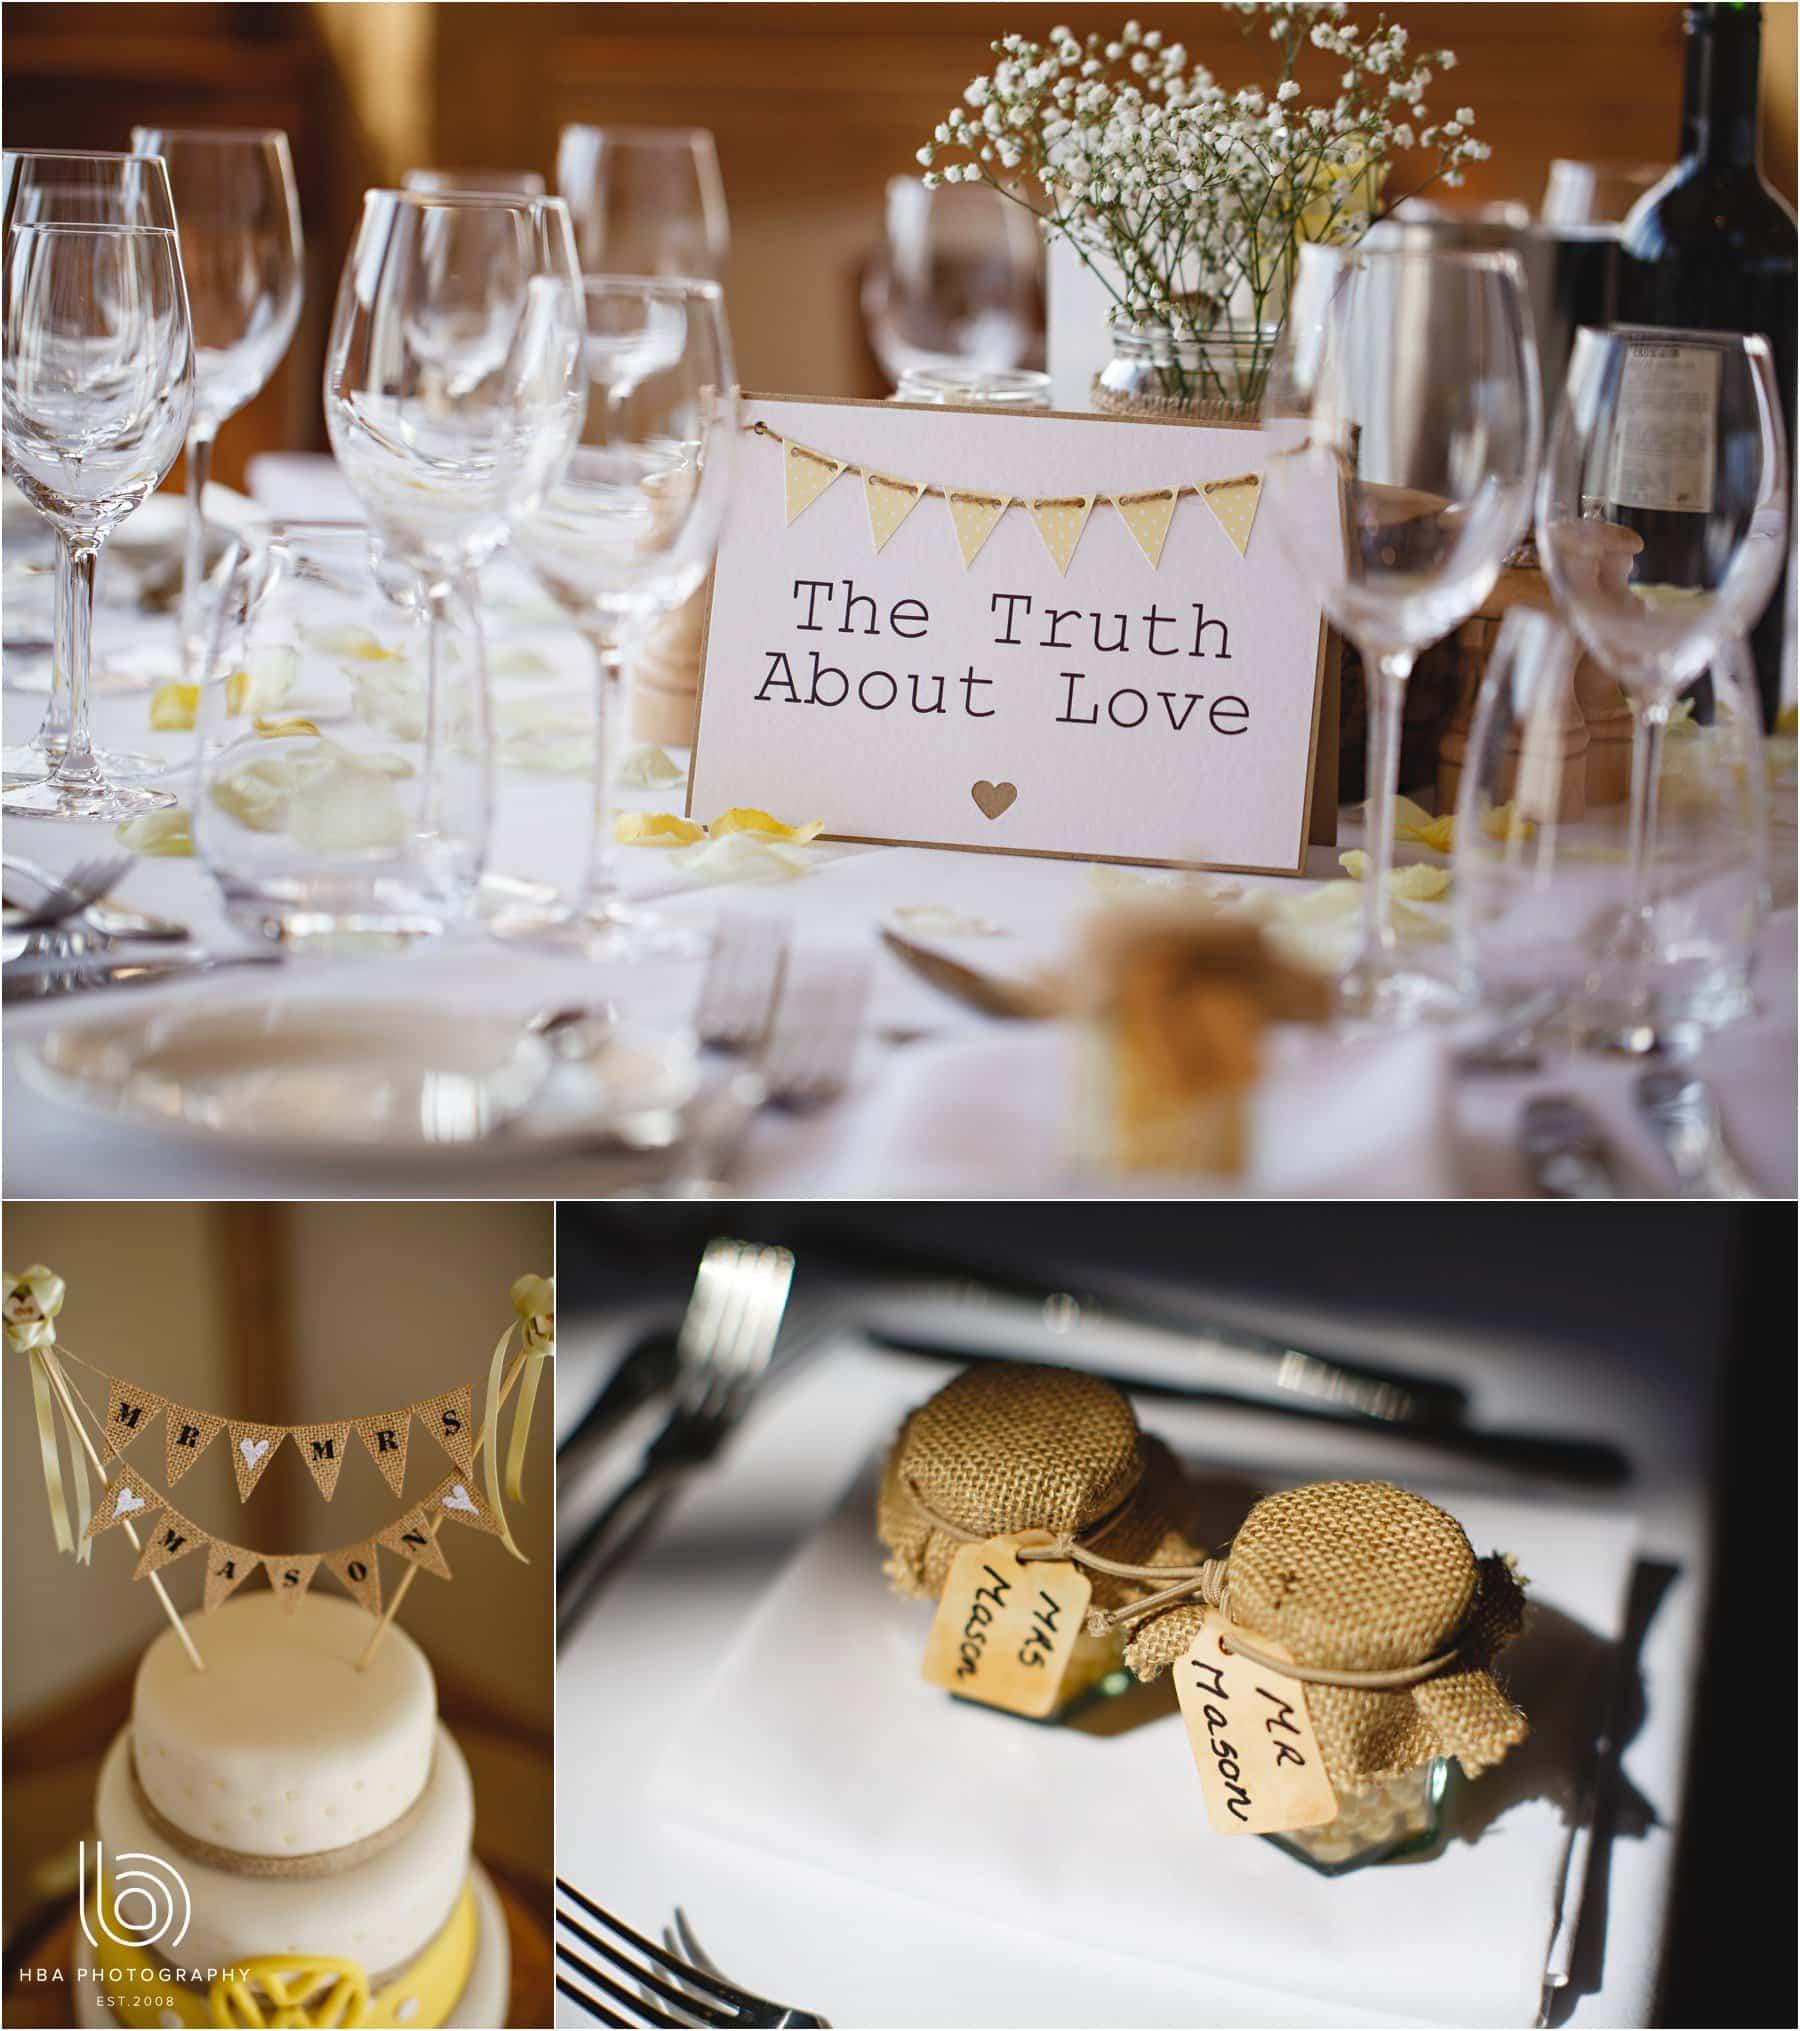 the wedding breakfast decorations